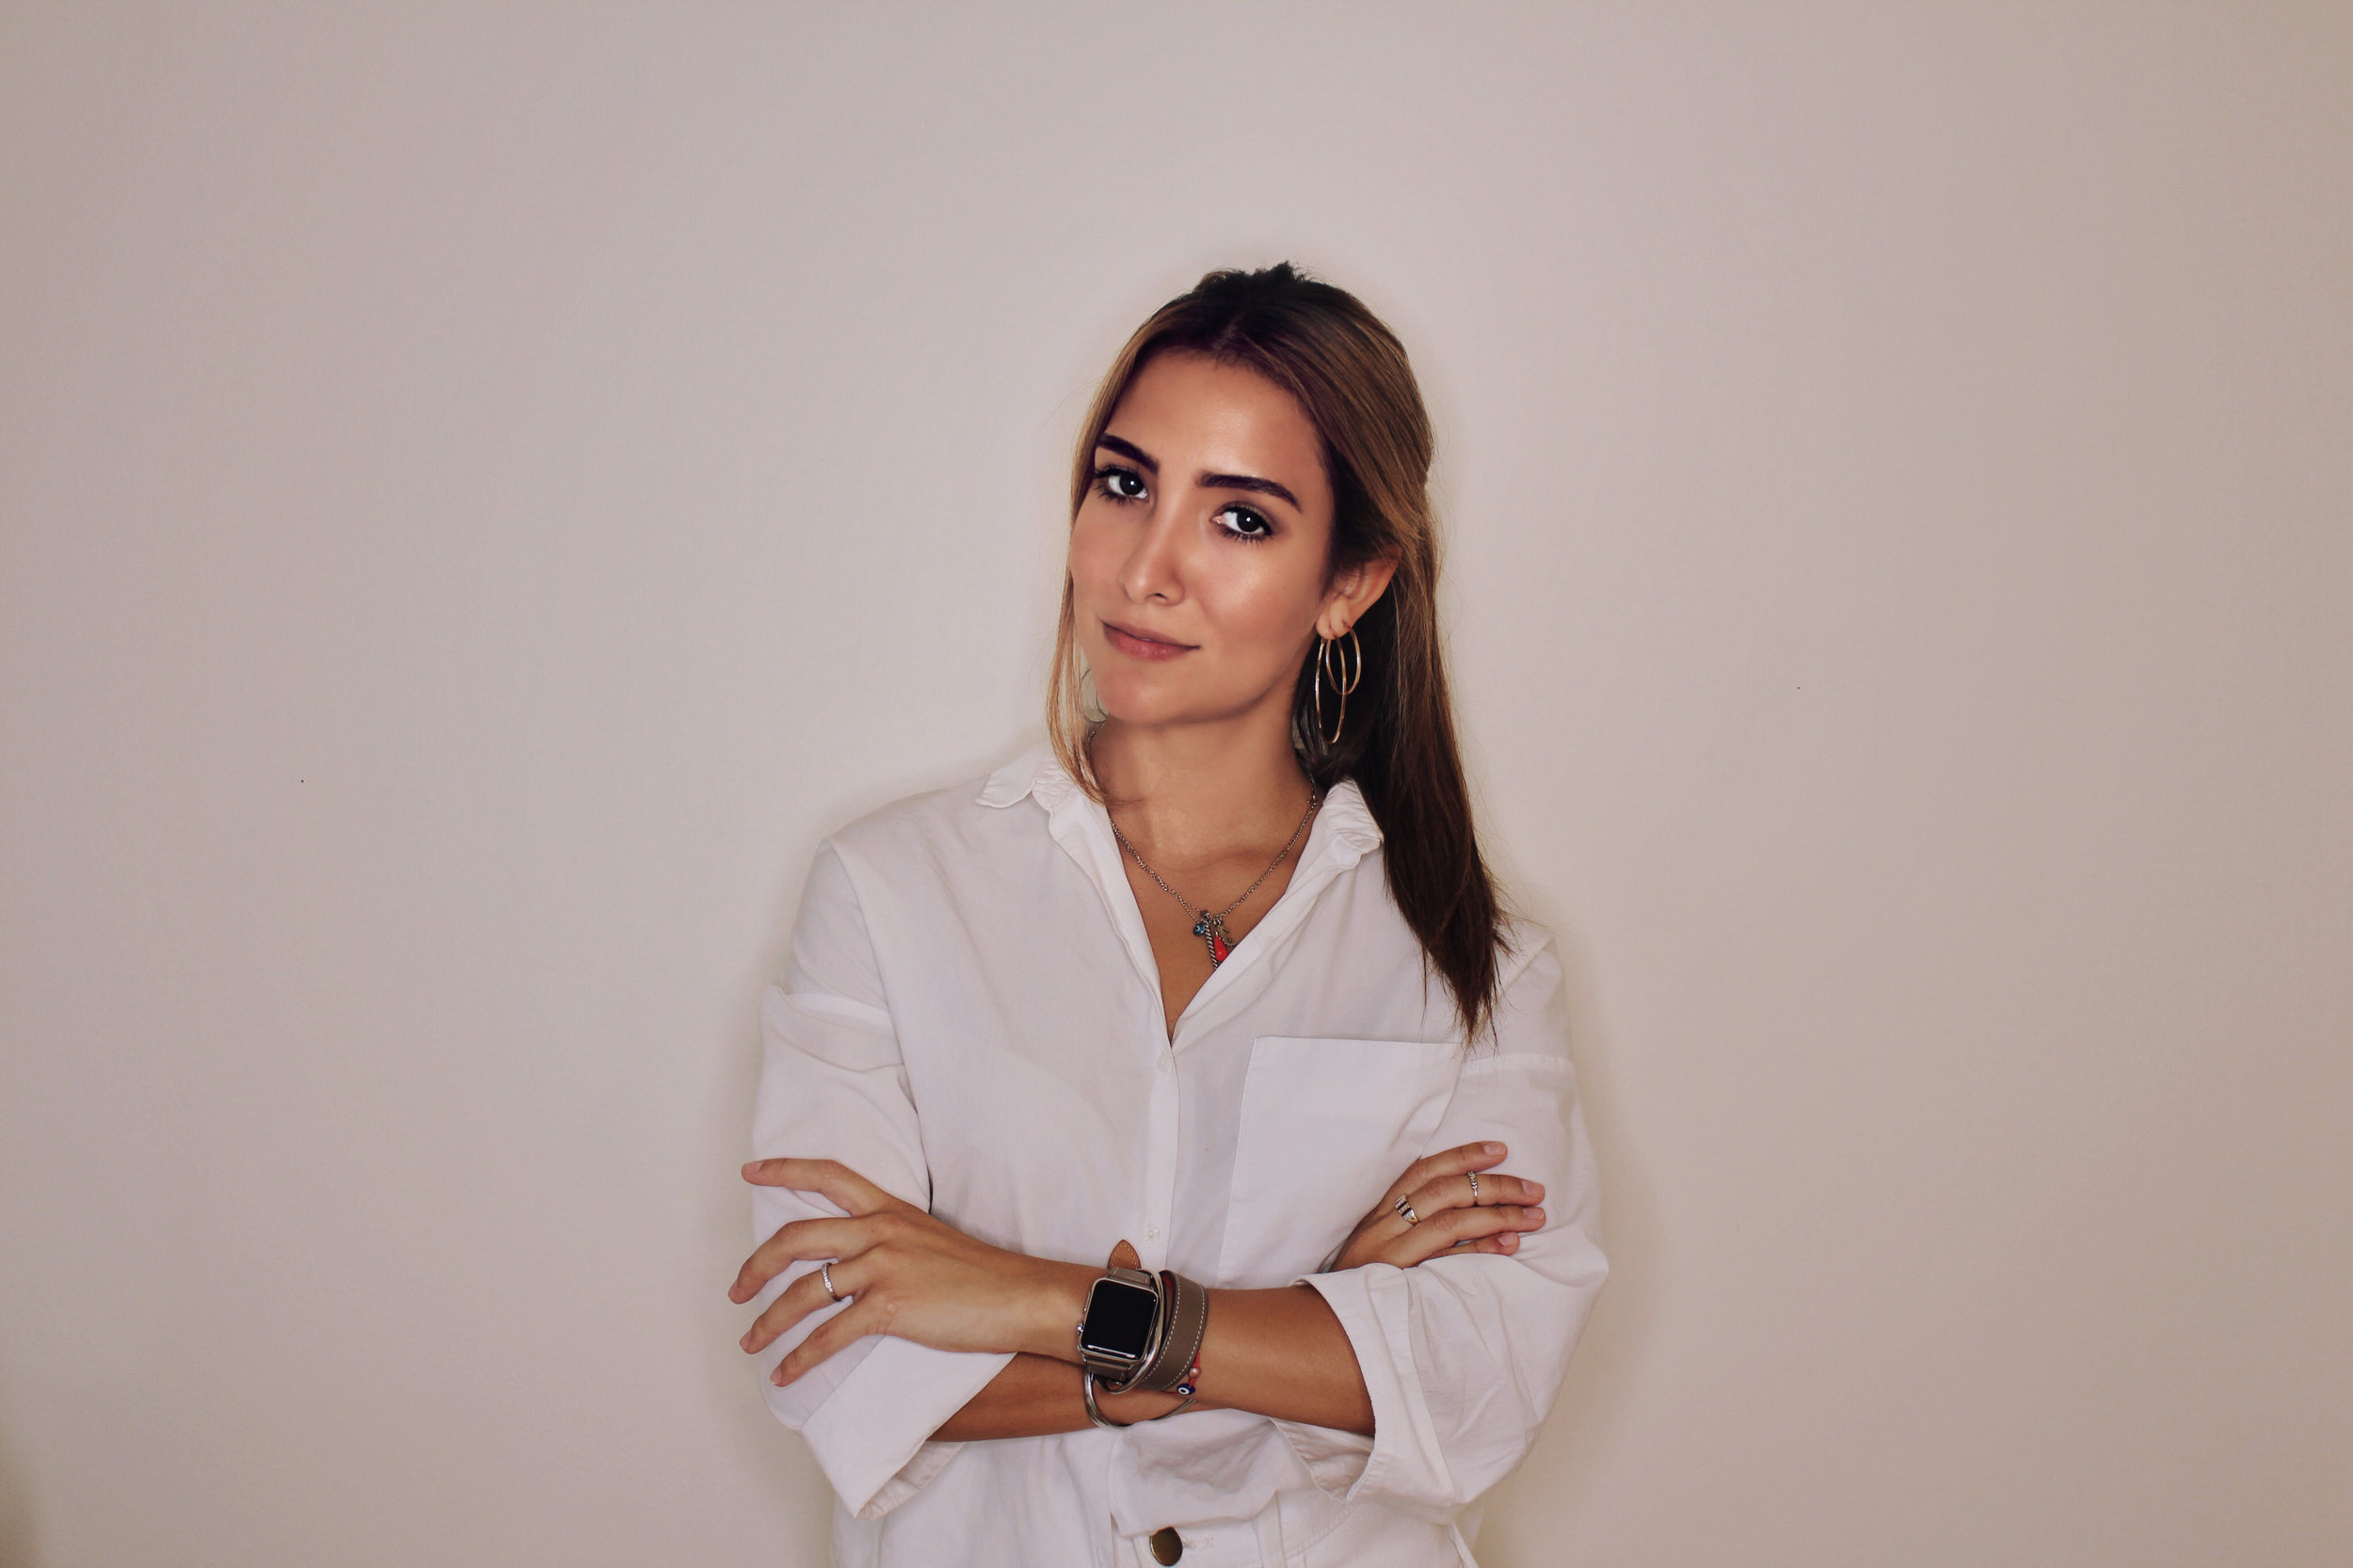 Mariana+Flores+Sosa-Portrait.jpg